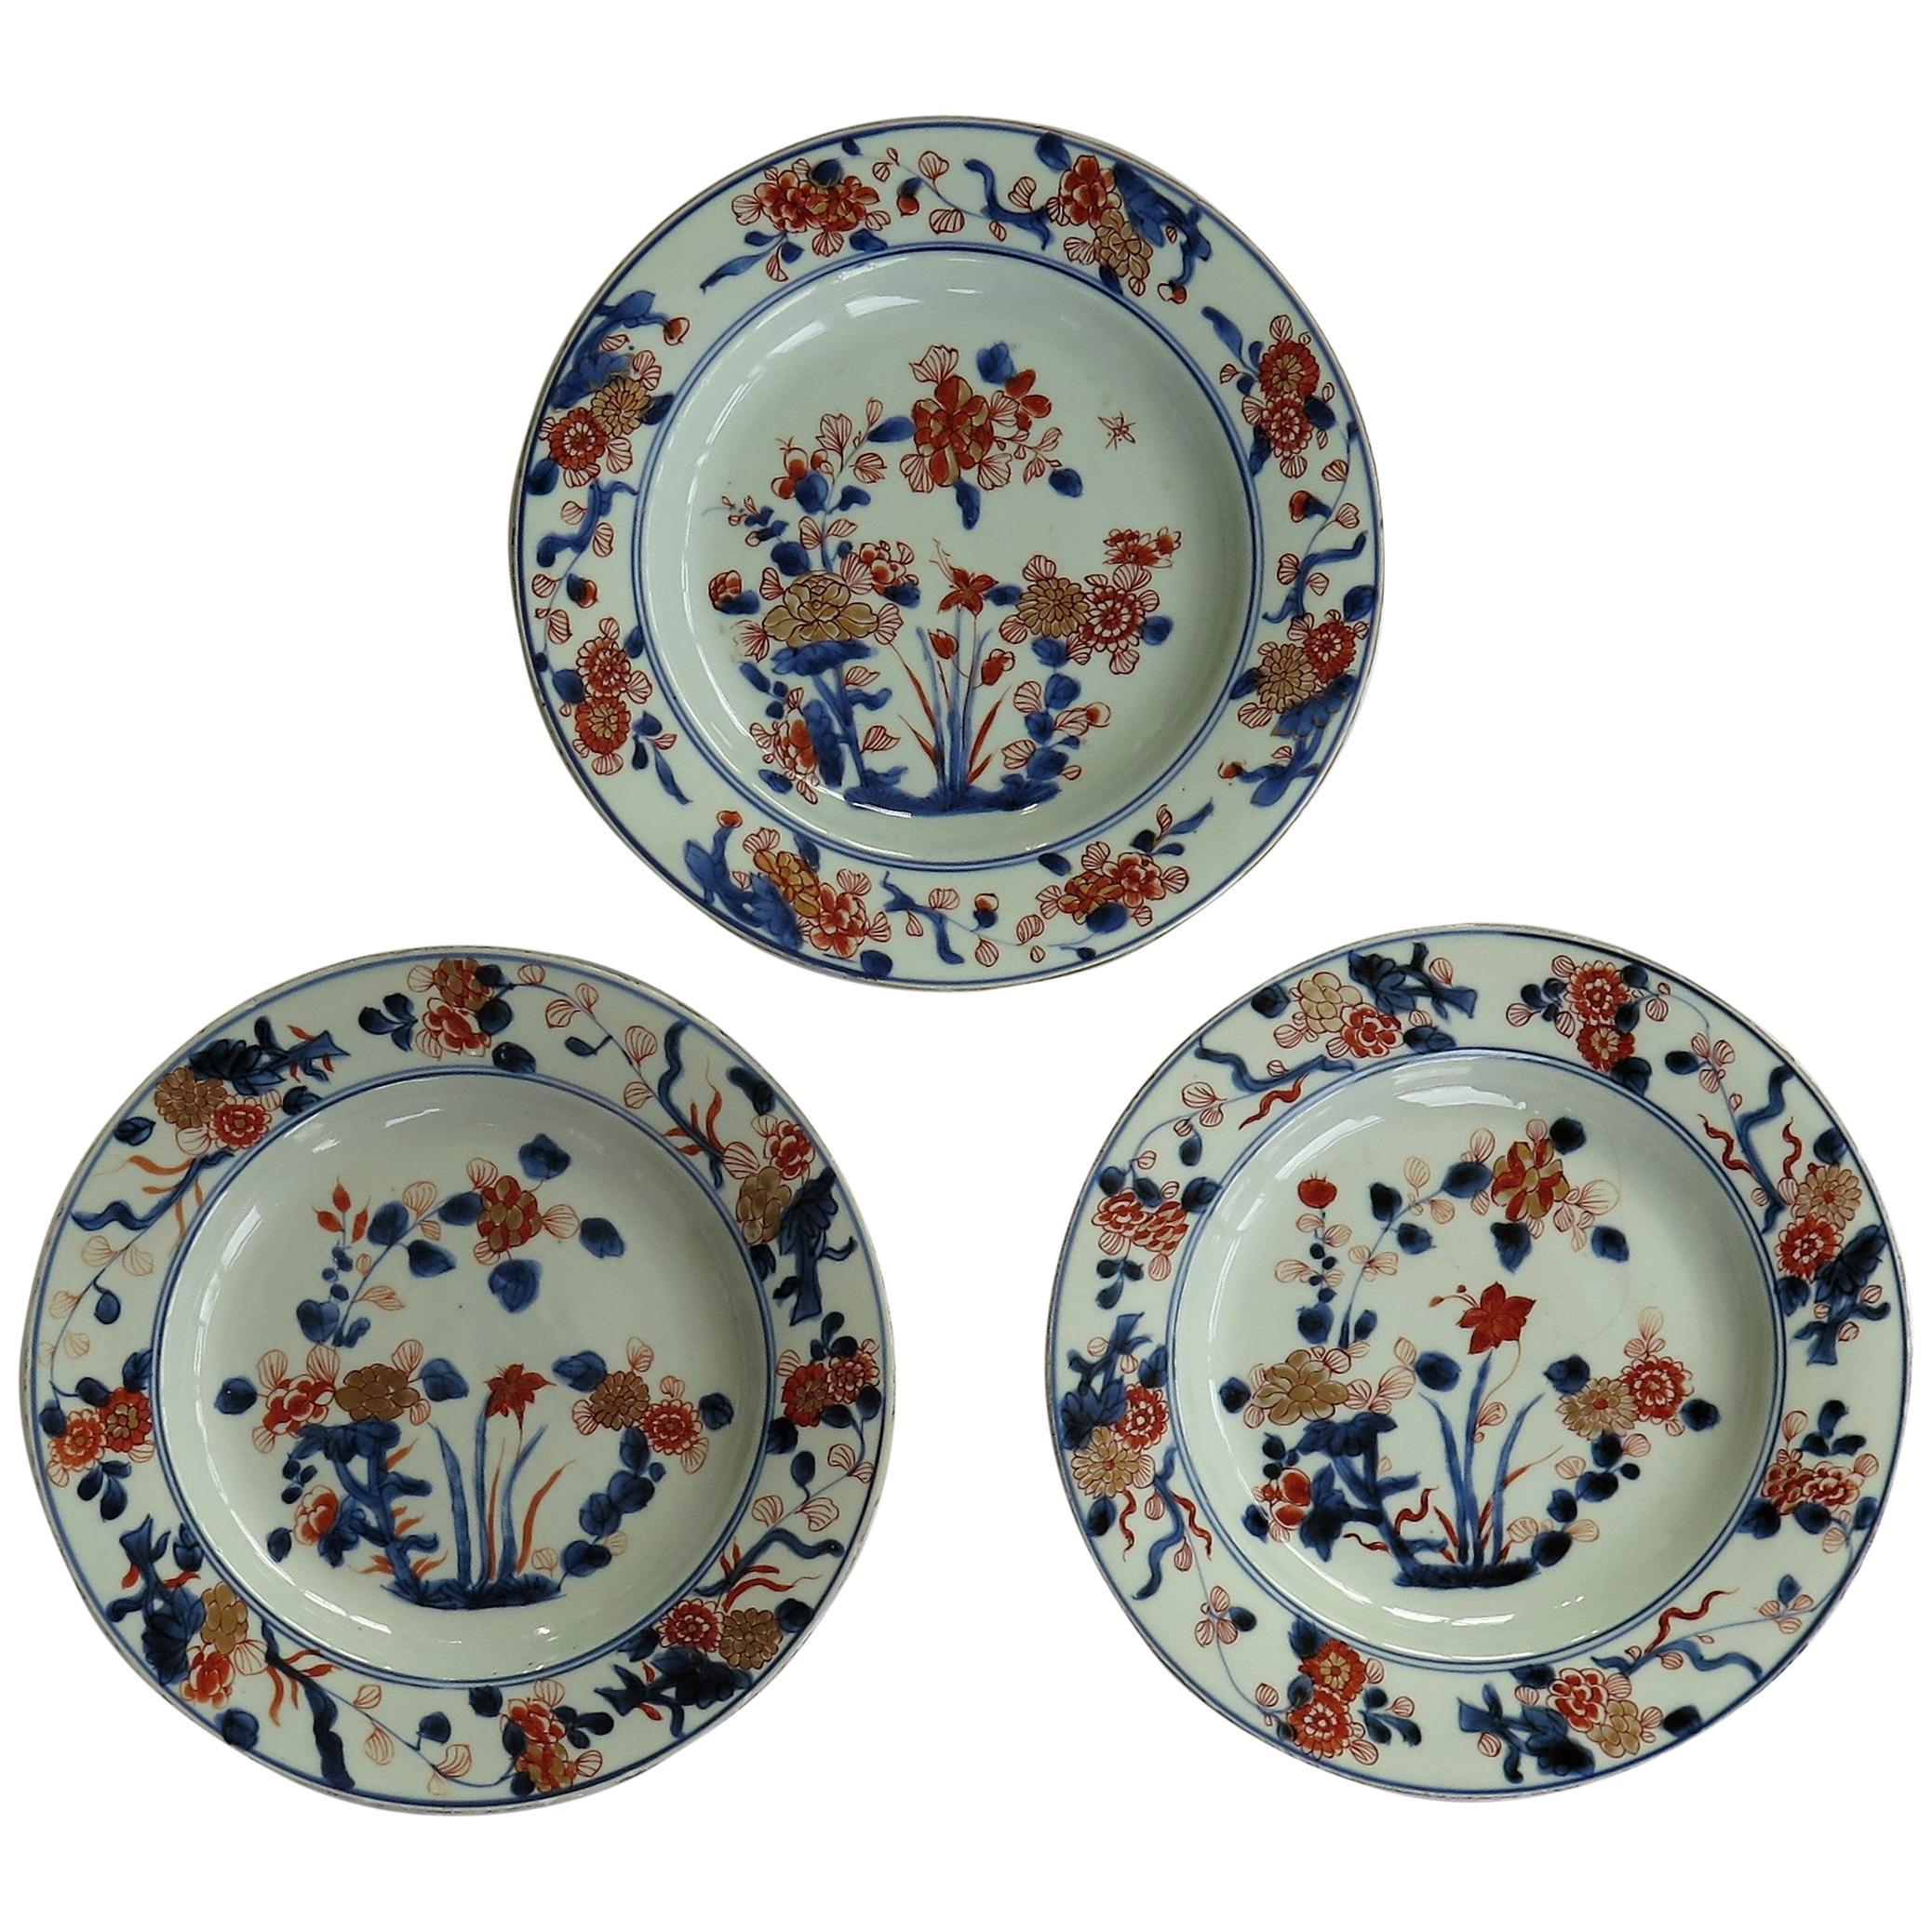 THREE Kangxi Chinese Export Porcelain Plates Artemisia Leaf Mark, Ca 1700